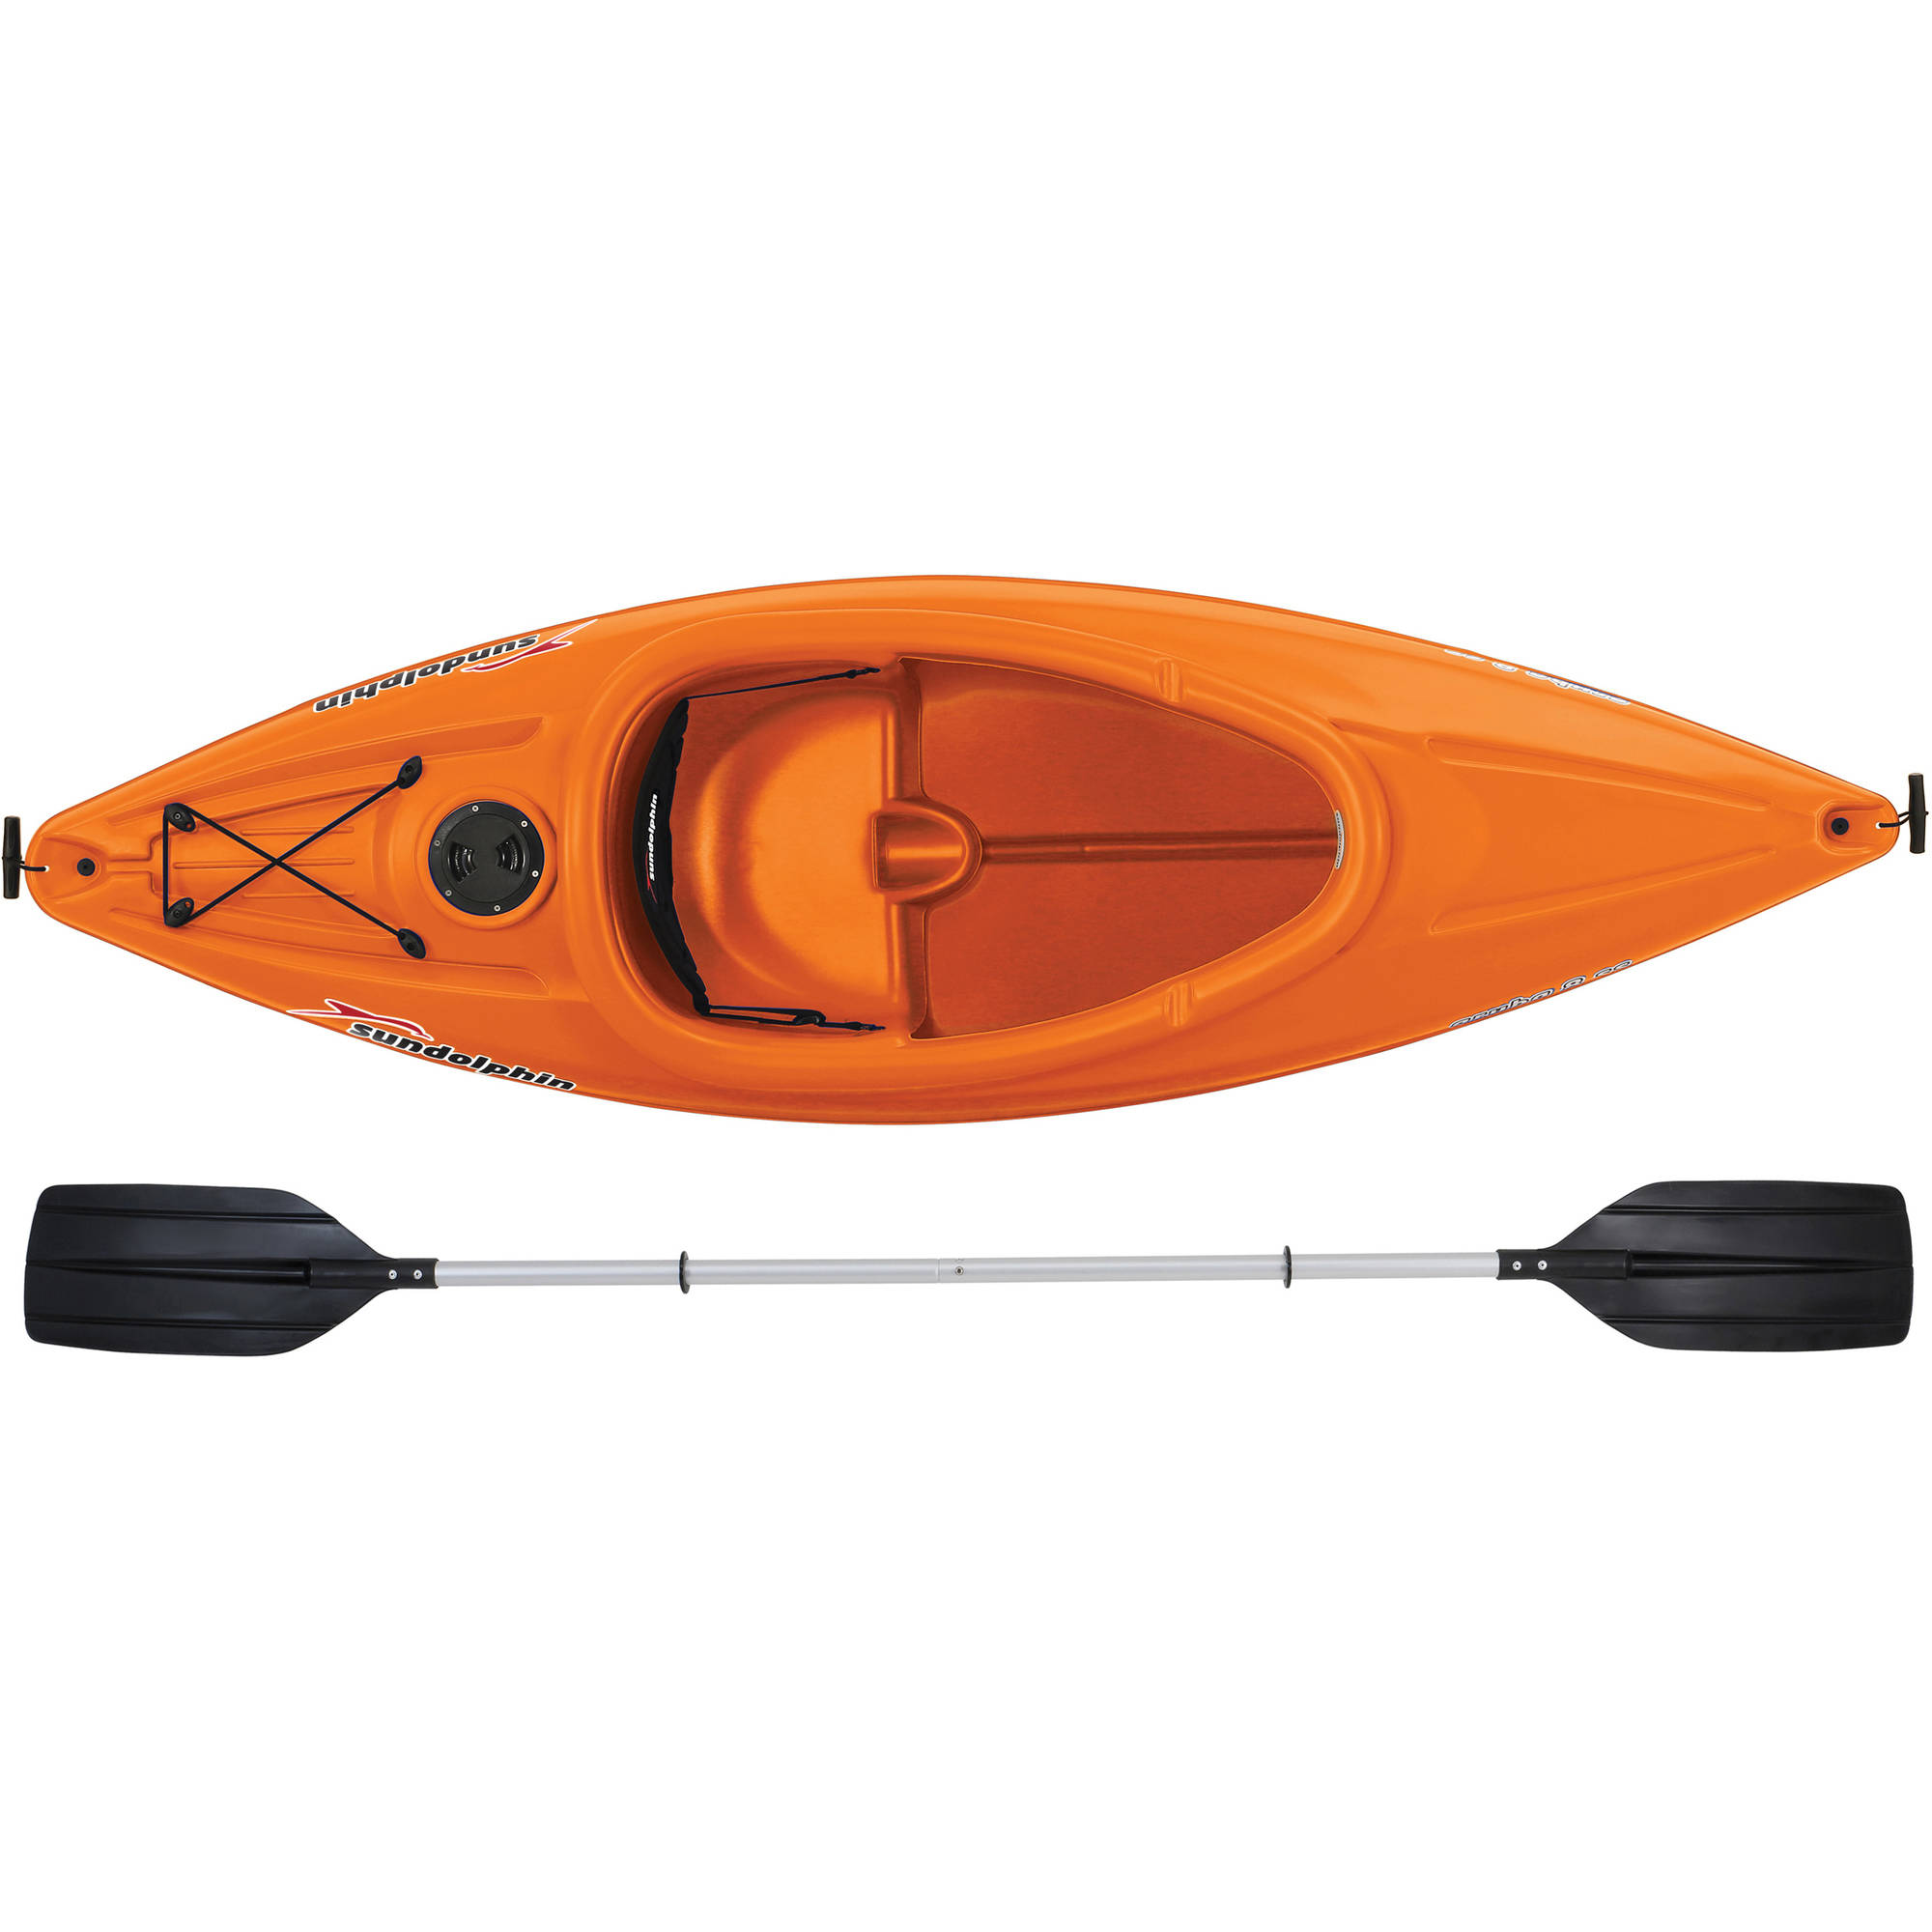 Sun Dolphin Aruba 8 Foot Ss Sit In Kayak 019862516758 Ebay